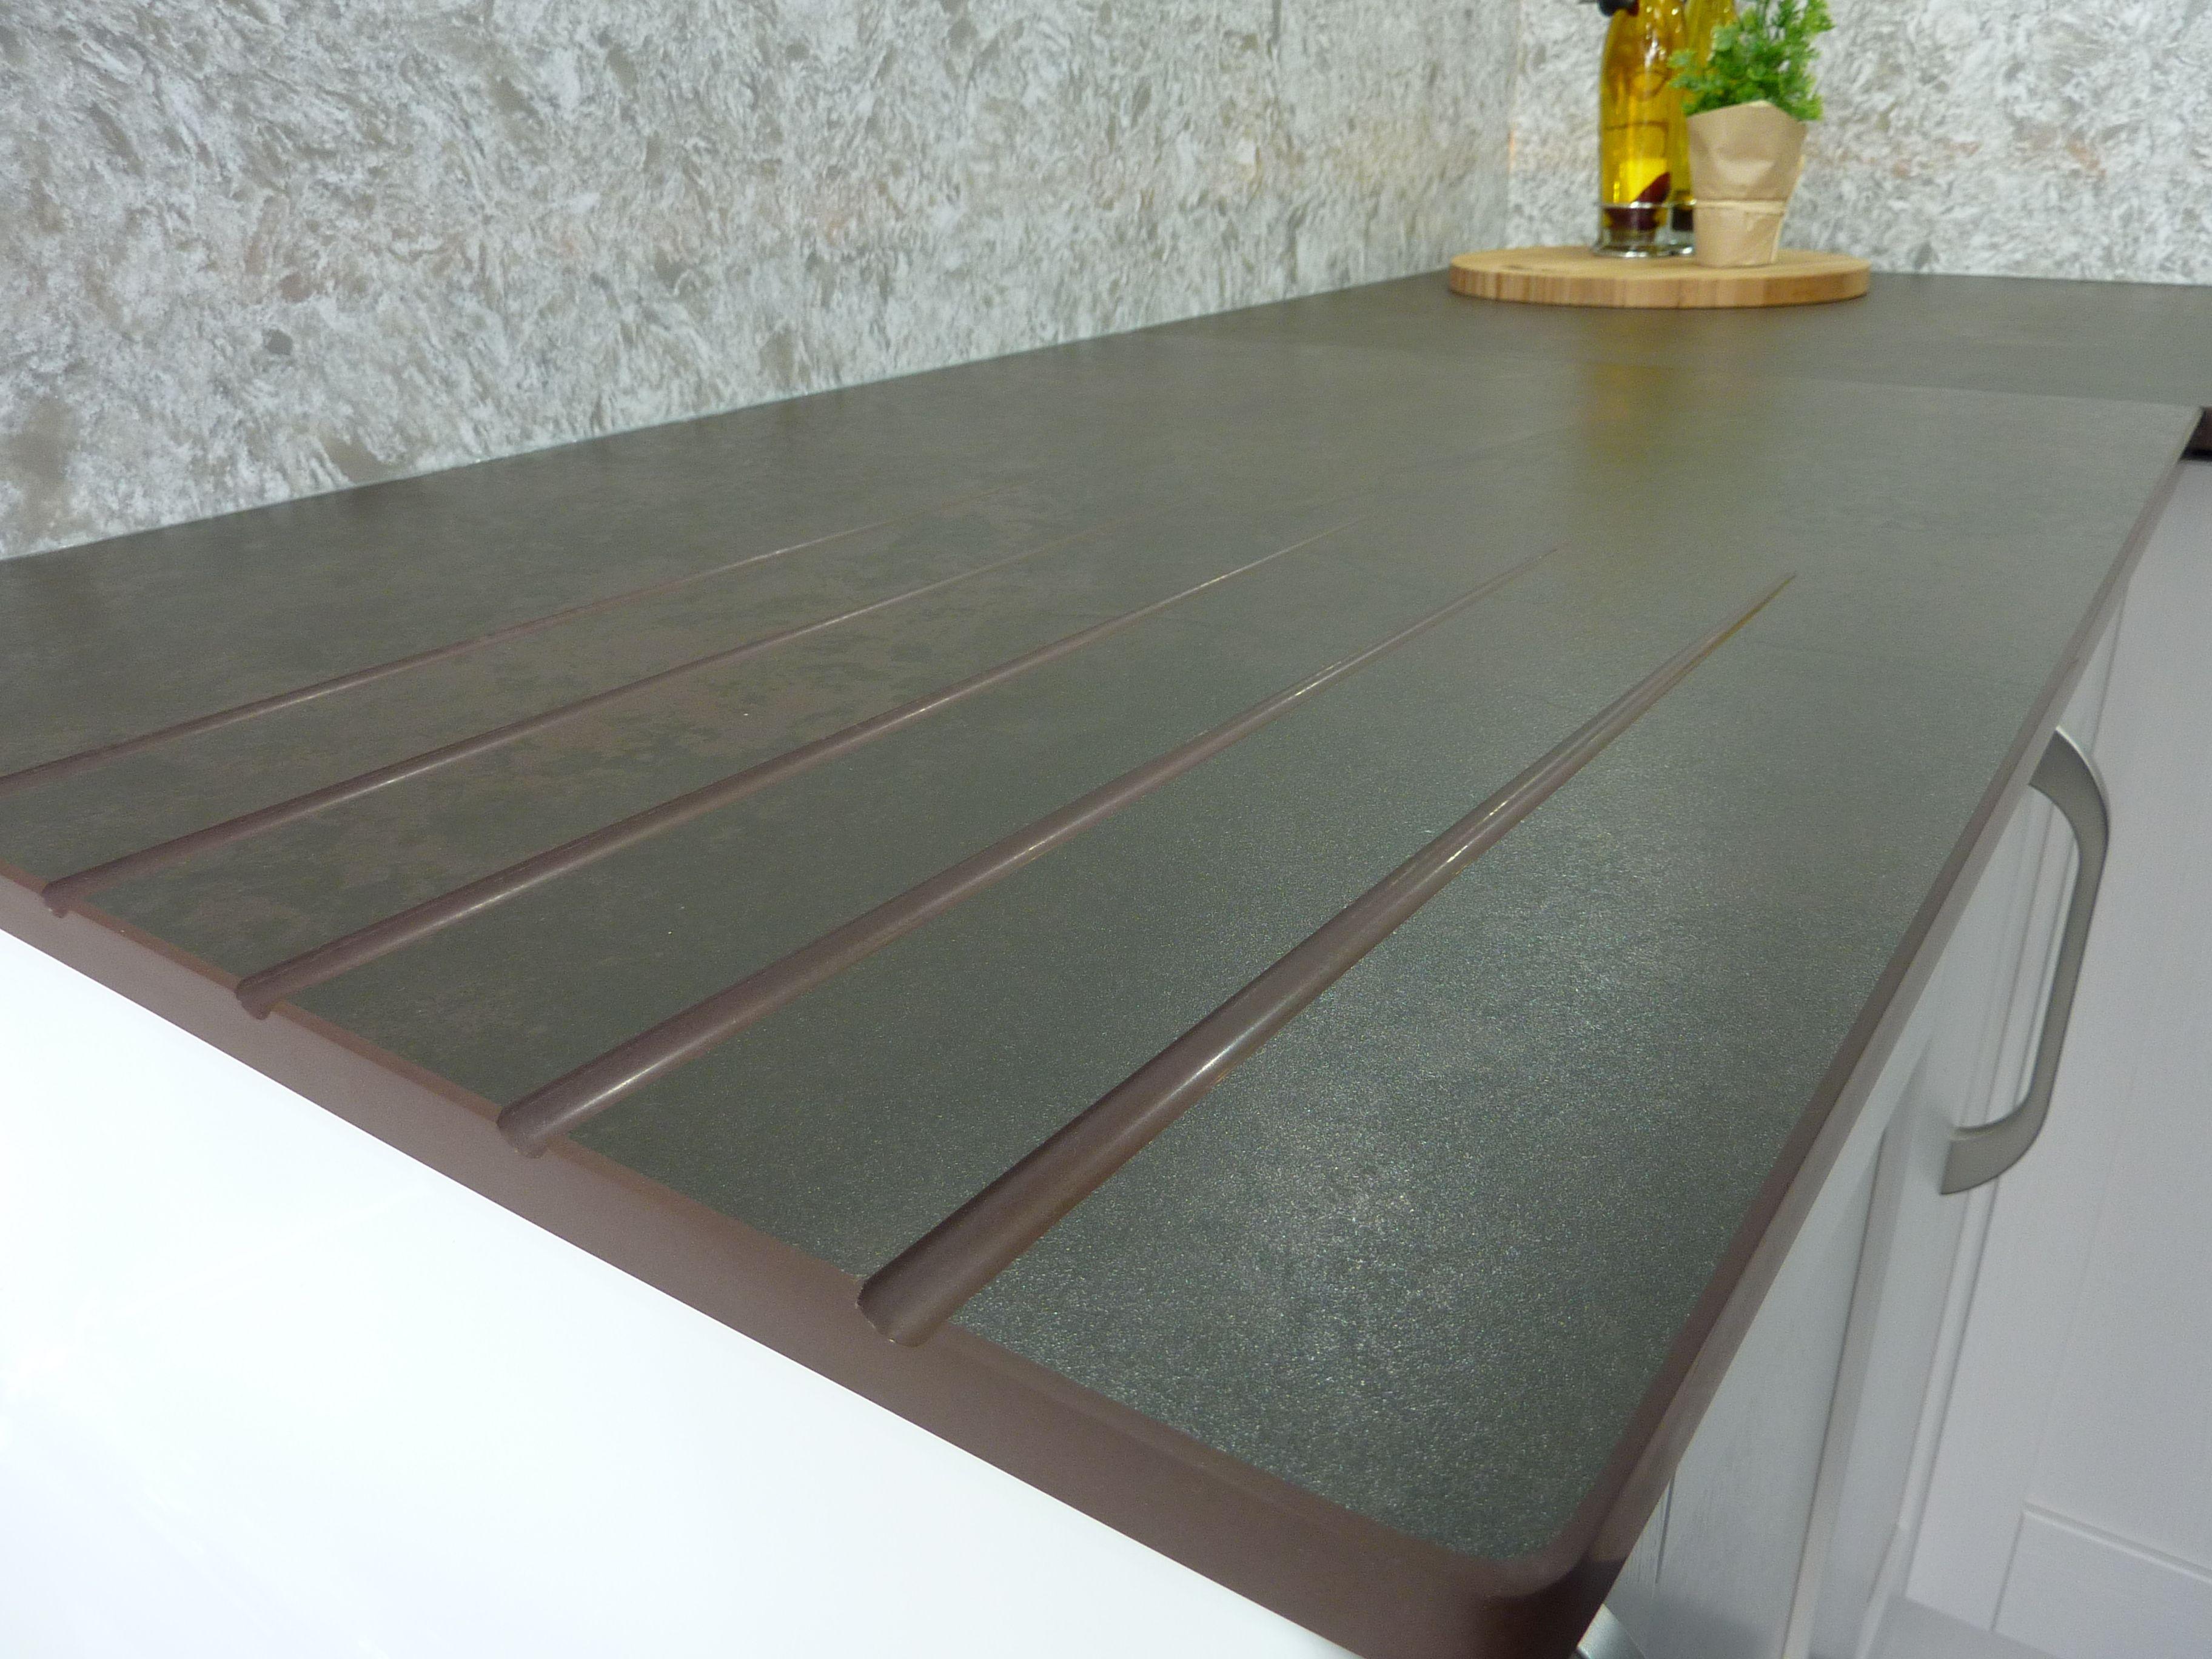 dekton keranium wokksurface with drainer grooves dekton kitchen pinterest cuisines. Black Bedroom Furniture Sets. Home Design Ideas